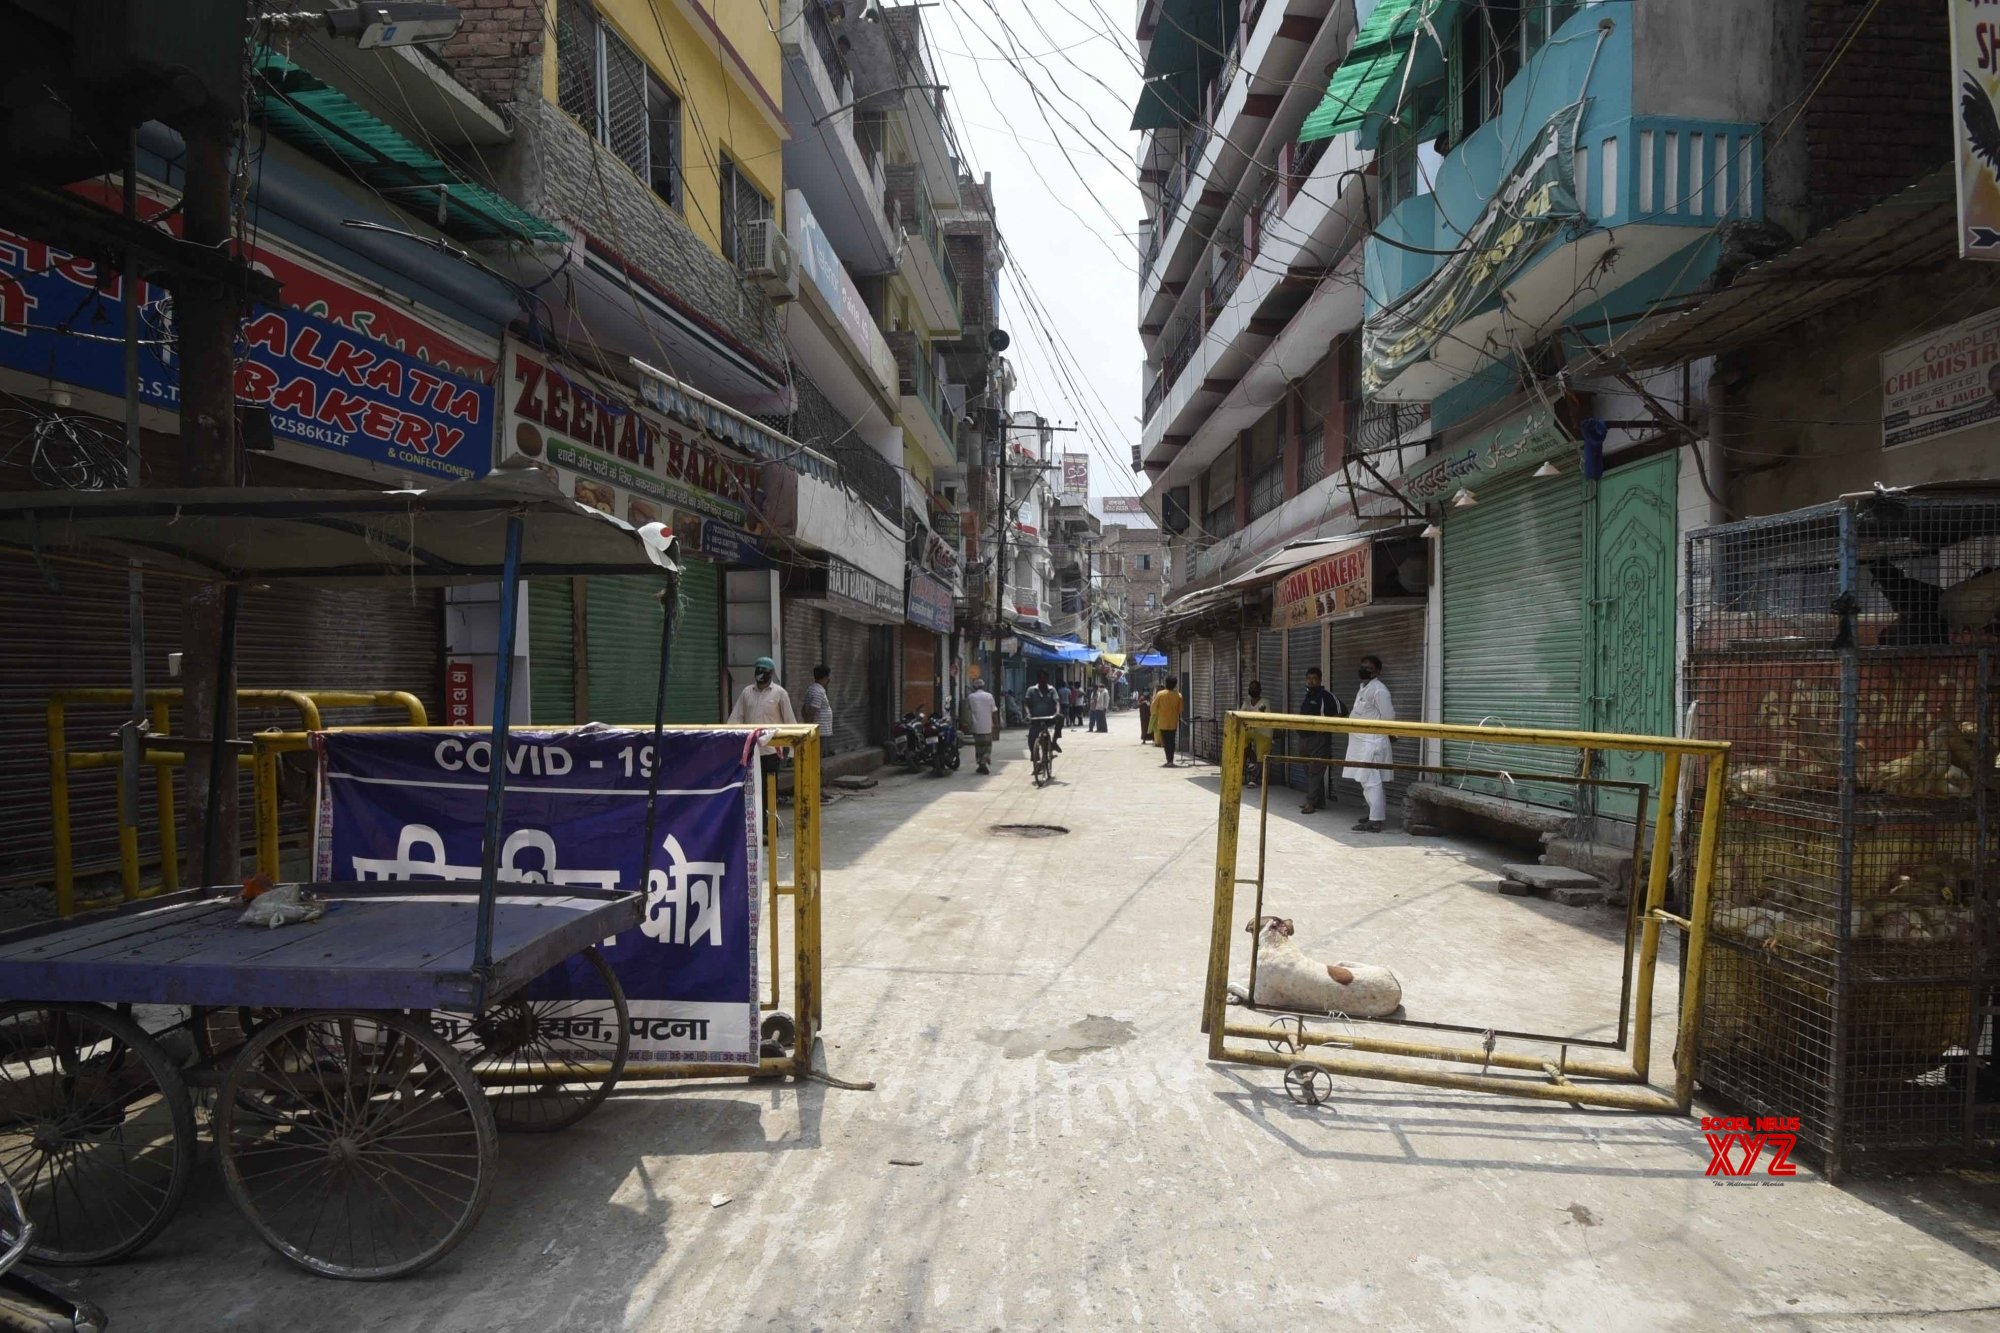 Bihar goes under lockdown till May 15 amid Covid surge